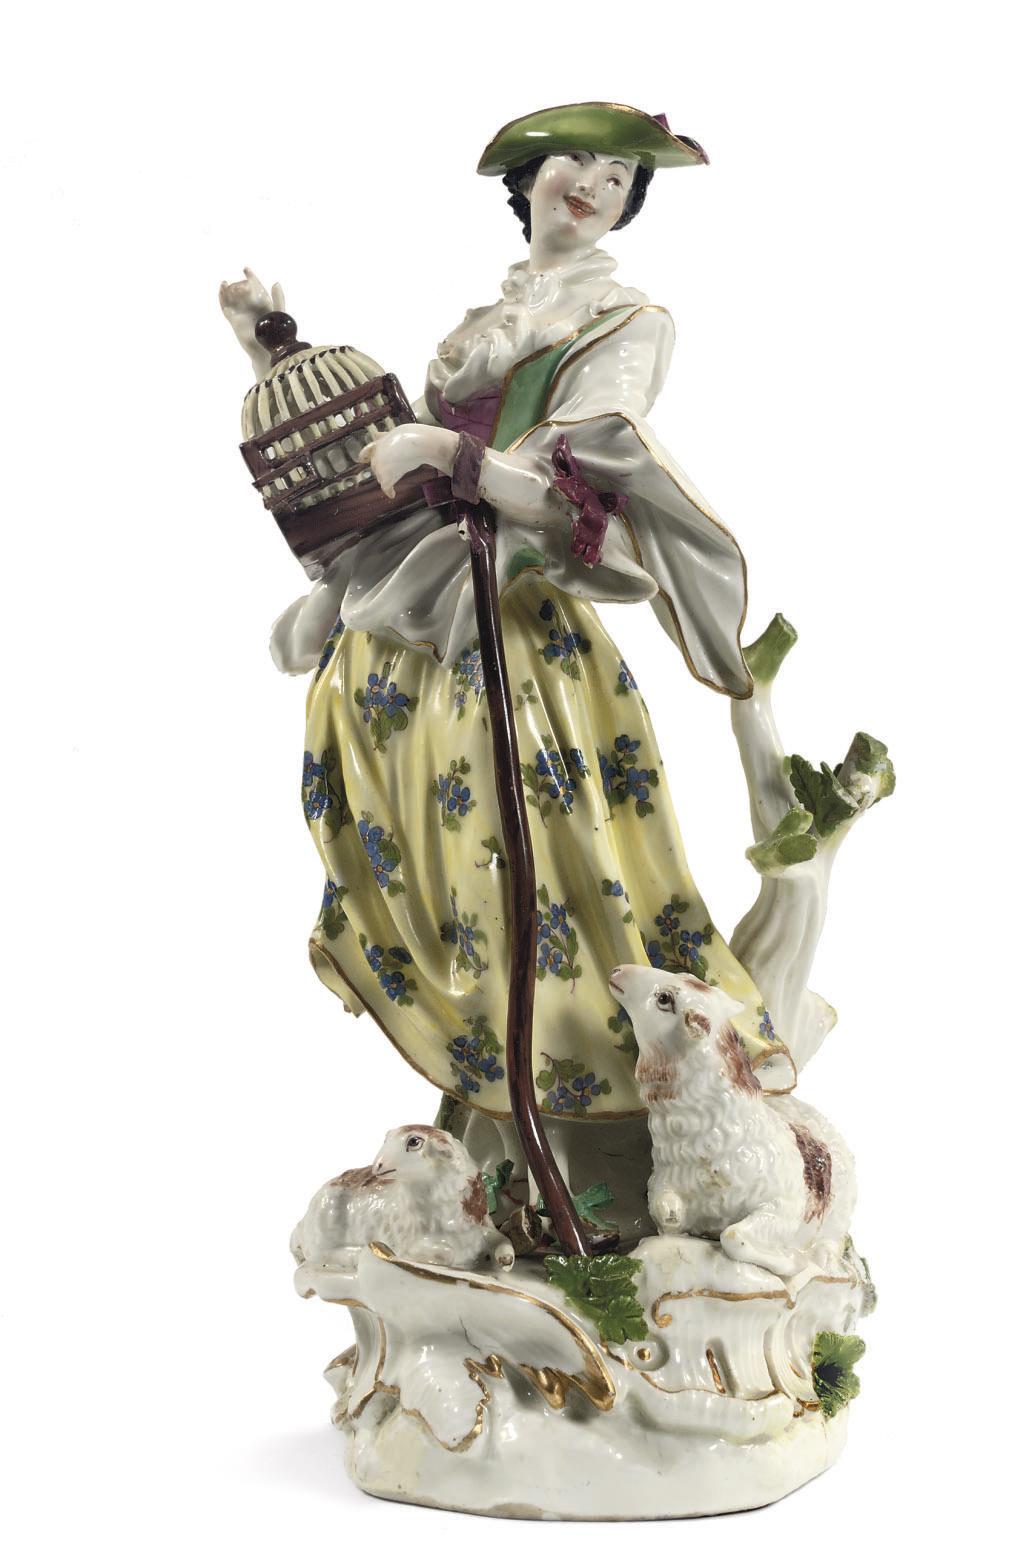 A Meissen porcelain figure of